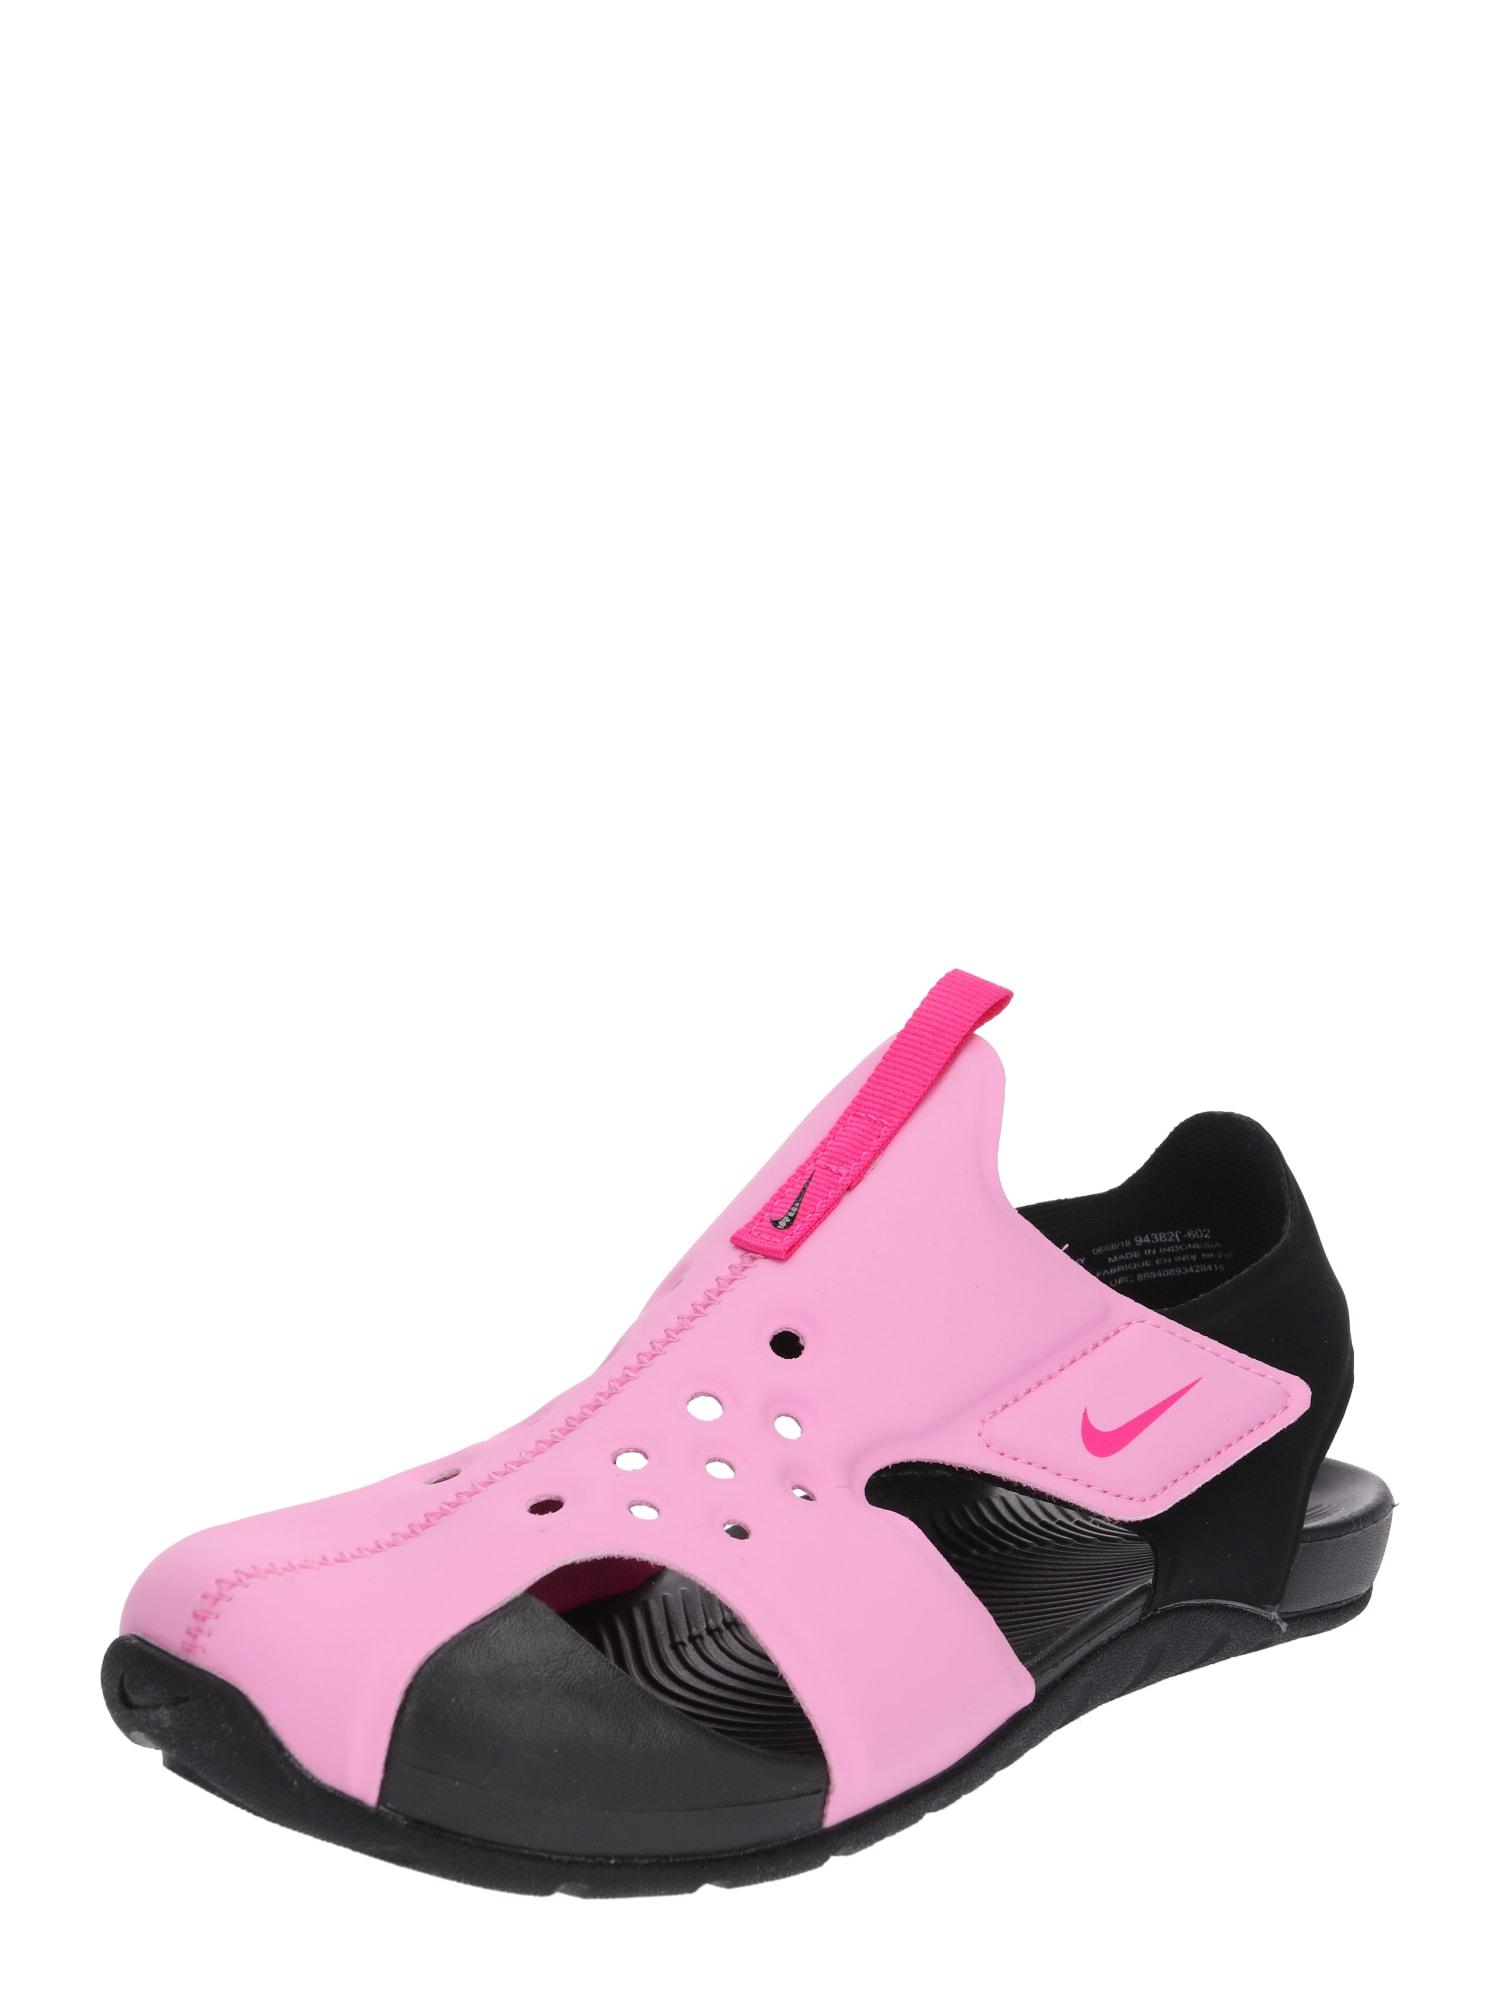 NIKE, Jongens Sportschoen 'Sunray Protect', pink / zwart